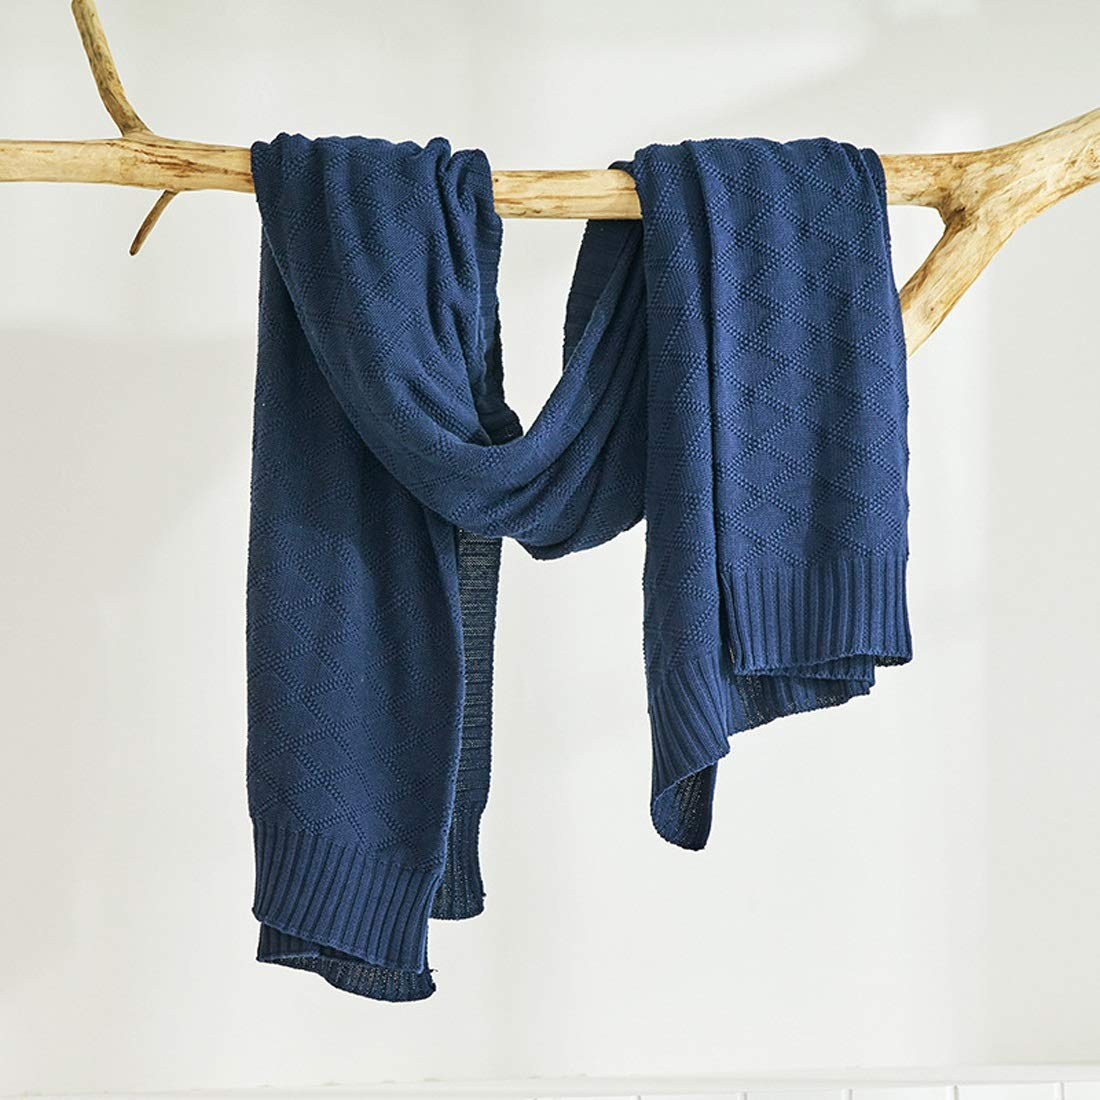 LilyAngel ホームオフィスの旅行浜のために適した編まれた毛布の綿の麻布の軽量のハンドメイドの余暇のソファーのエアコンのキルト (色 : 青, サイズ : 180*200CM) 180*200CM 青 B07SFC8FNY